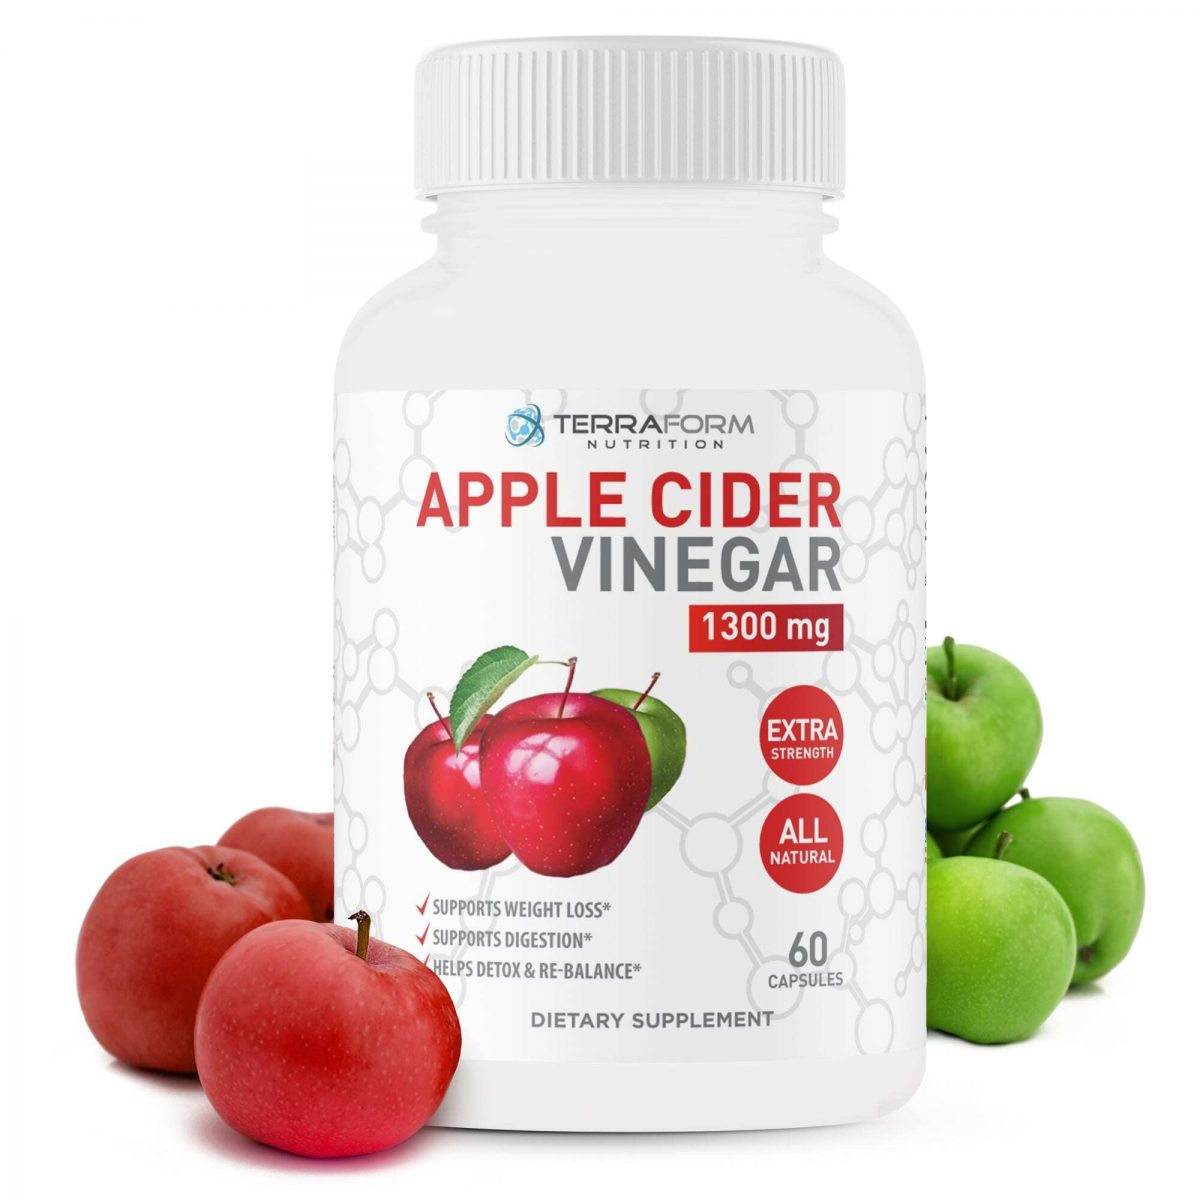 Apple Cider Vinegar 1300mg – 60 Capsules - TerraForm Nutrition-0